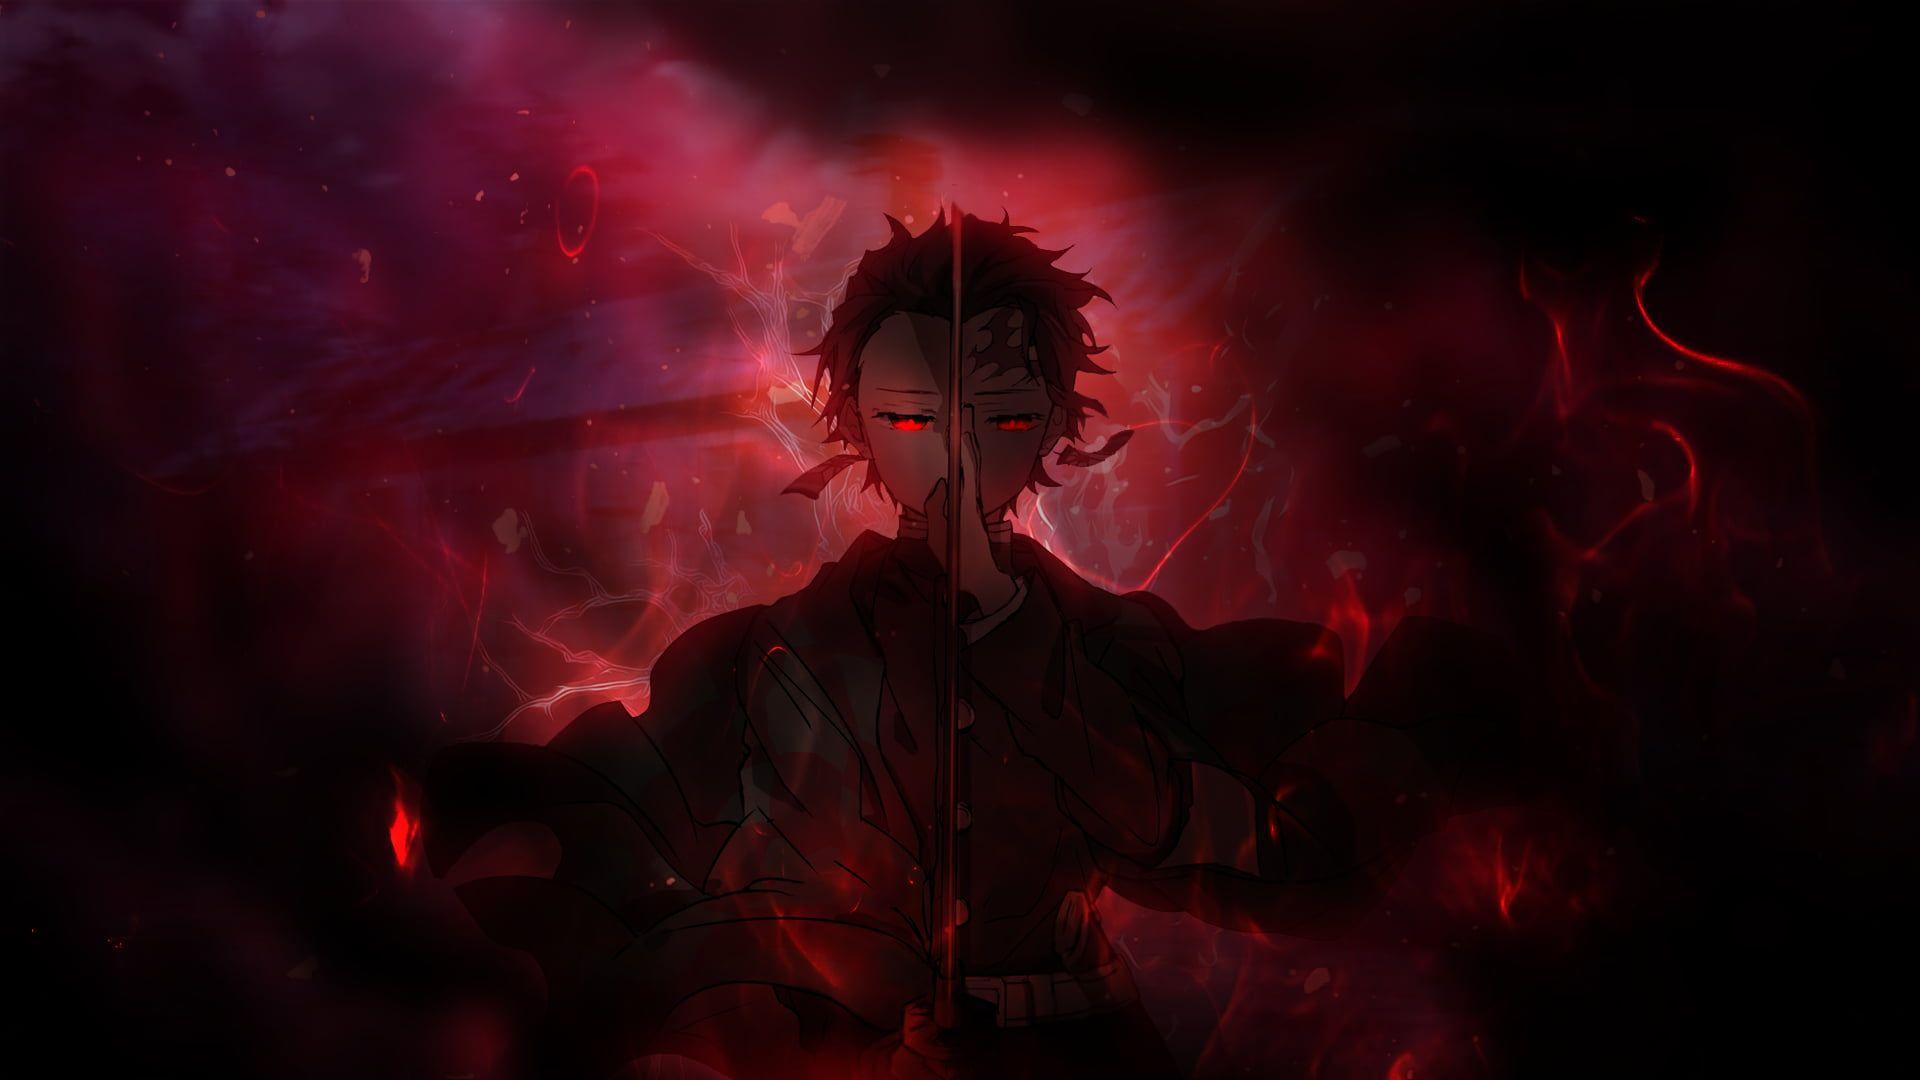 Anime Demon Slayer Kimetsu No Yaiba Tanjirou Kamado 1080p Wallpaper Hdwallpaper Deskt Anime Wallpaper Download Hd Anime Wallpapers Cool Anime Backgrounds